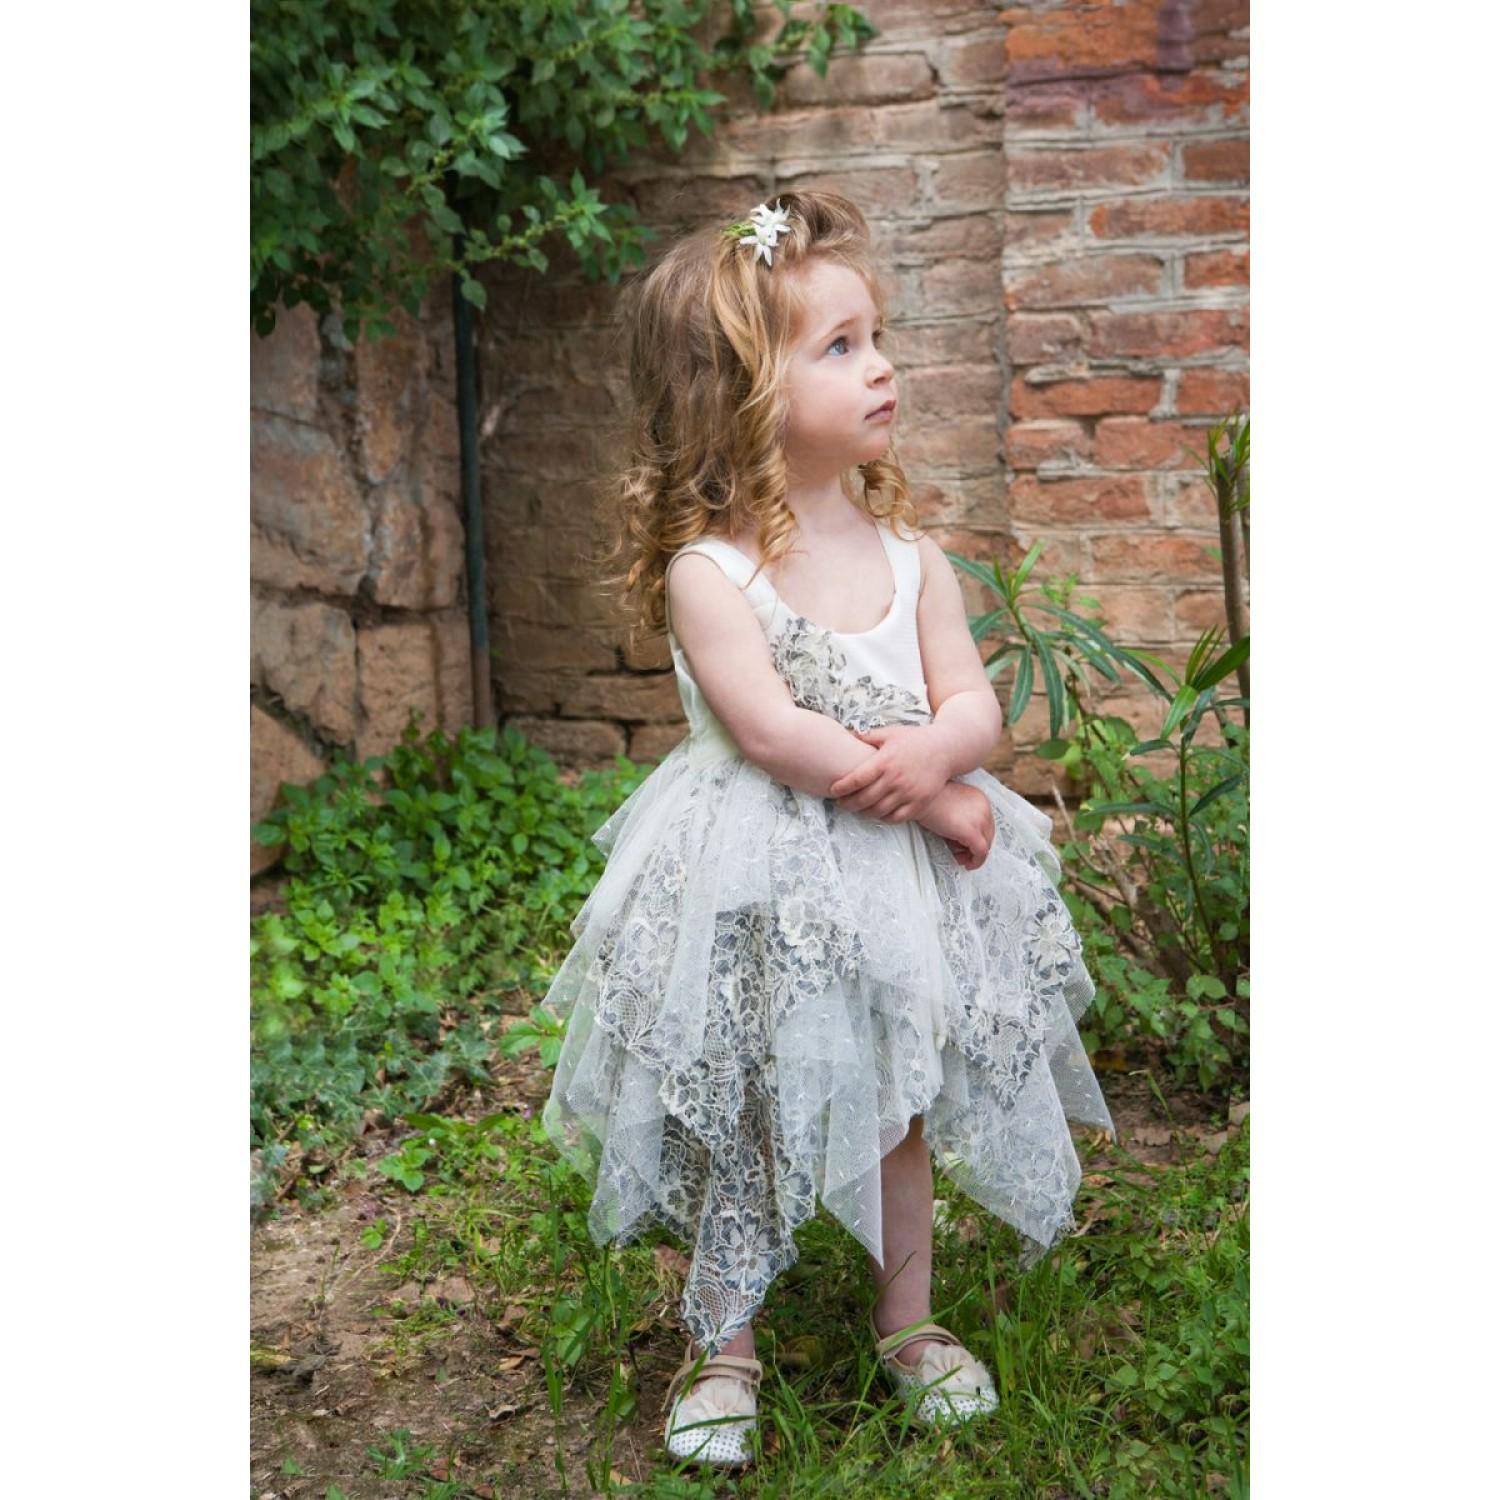 facd9b71f7b1 Φόρεμα Βάπτισης Makis Tselios 2017gts10 - Papillon eShop ...